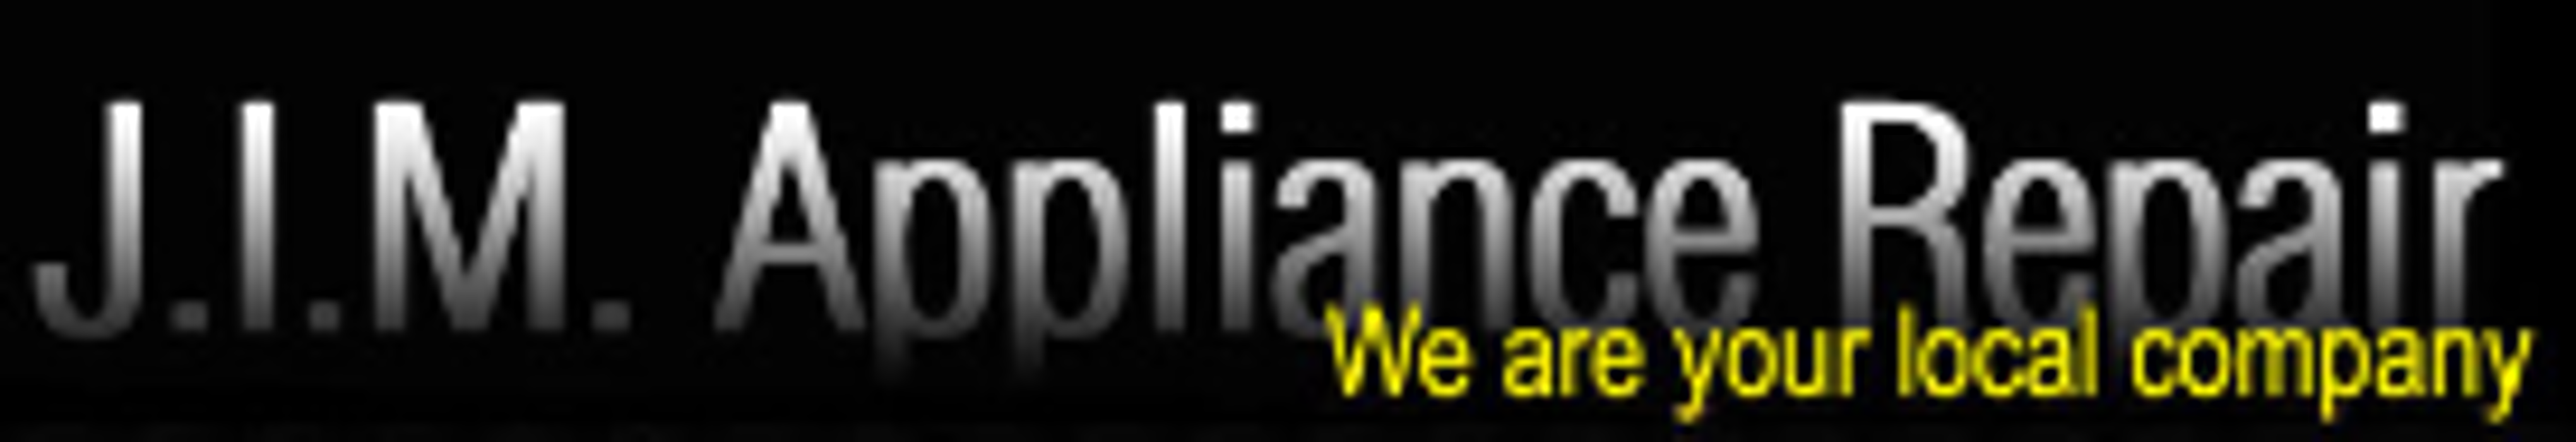 Jim Appliance Repair - Diamond Bar, CA